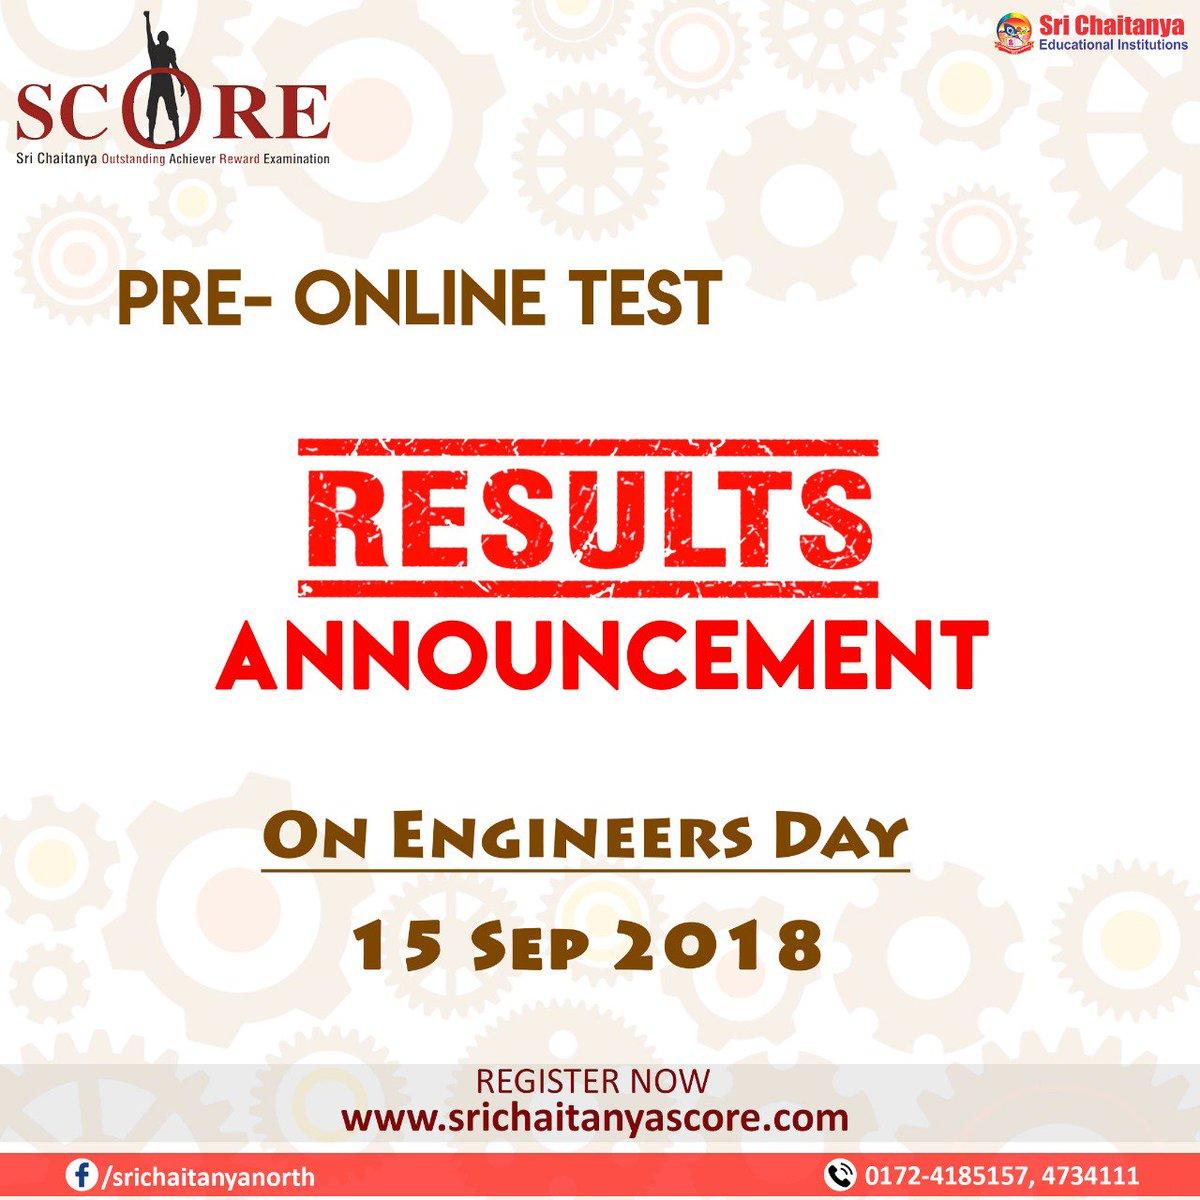 Sri Chaitanya Online Tests